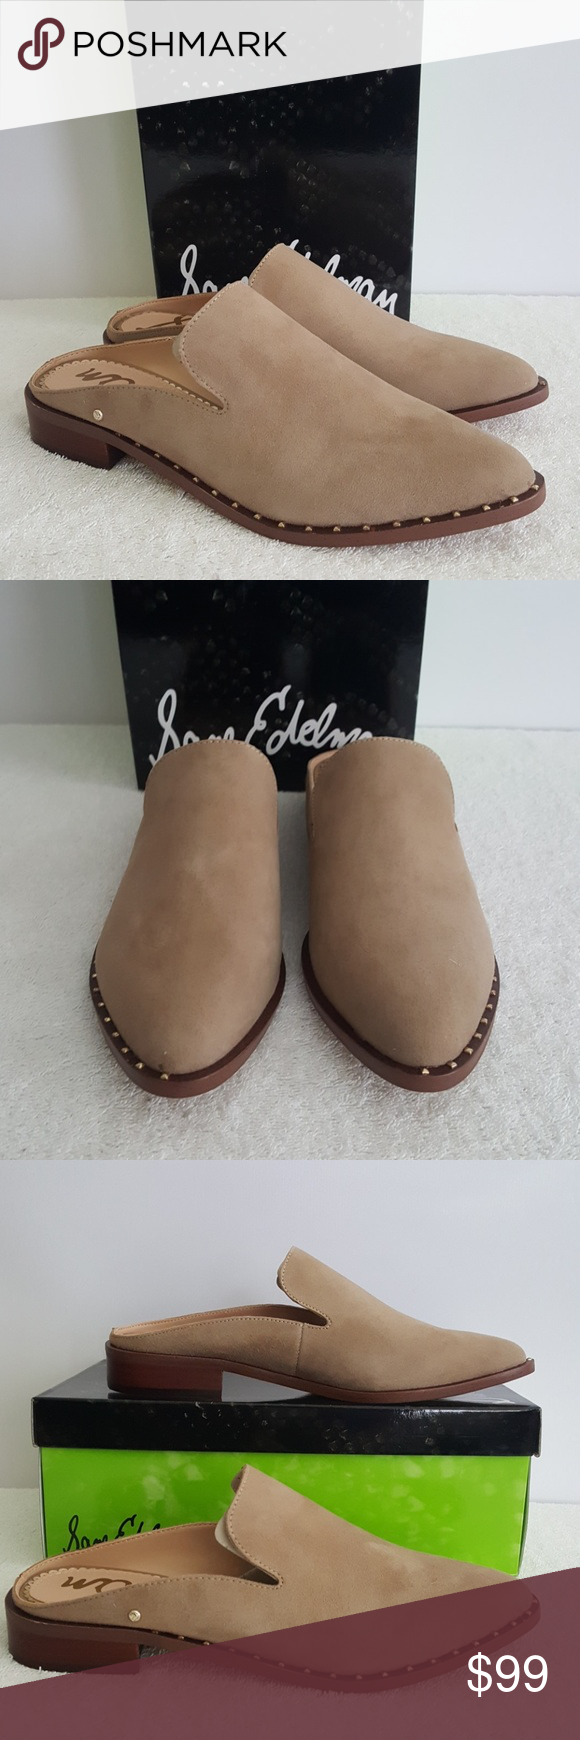 New Sam Edelman Lewellyn Leather Mule